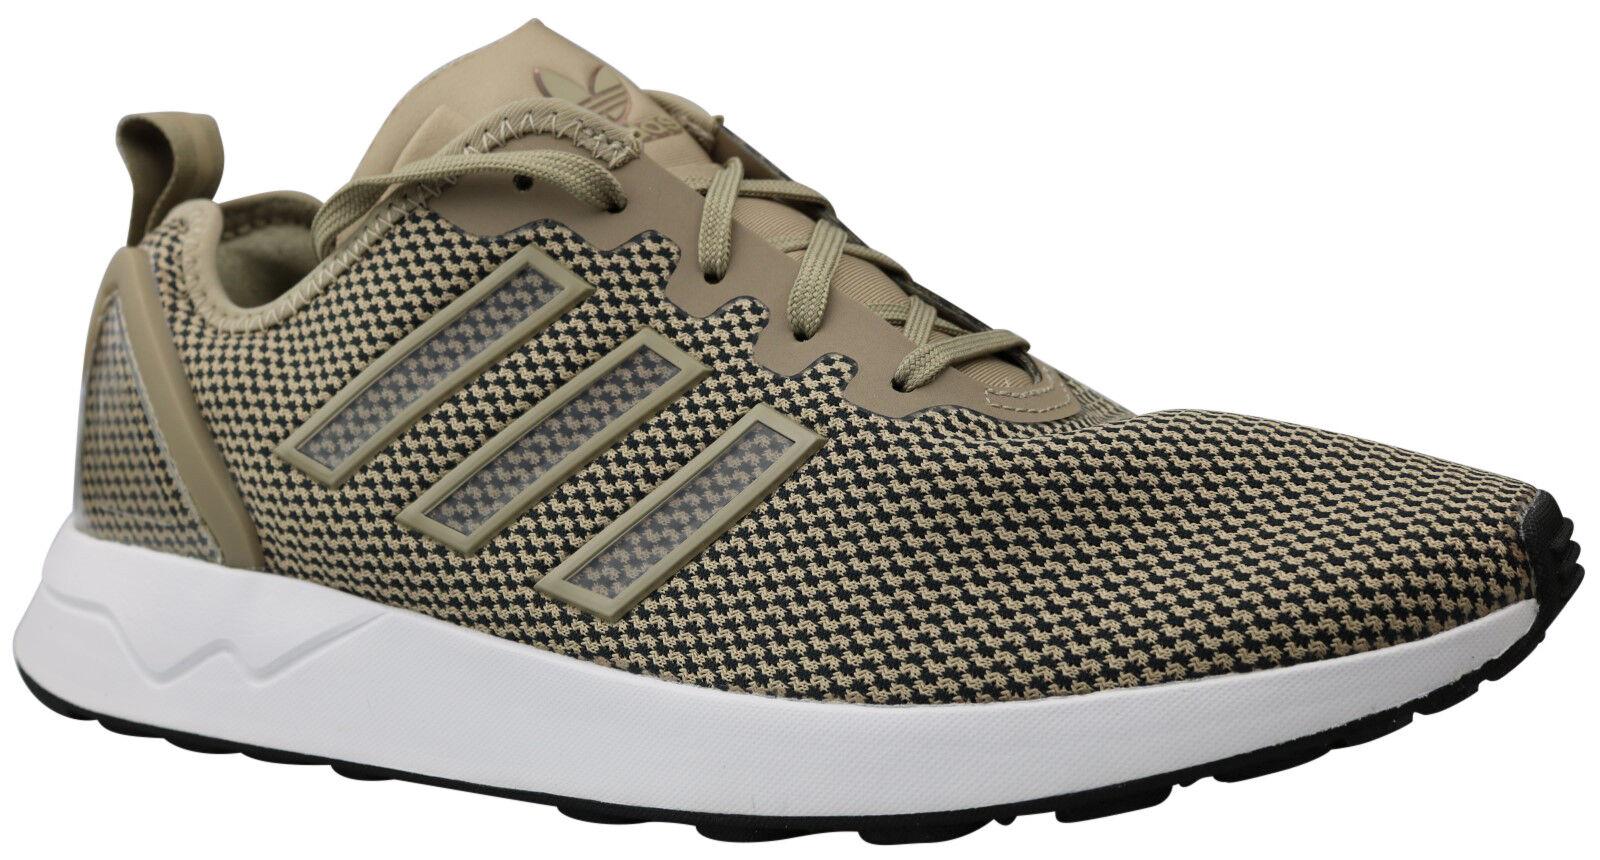 Adidas Flux Messieurs Zx Chaussures Beige Sneaker Adv qEESrU